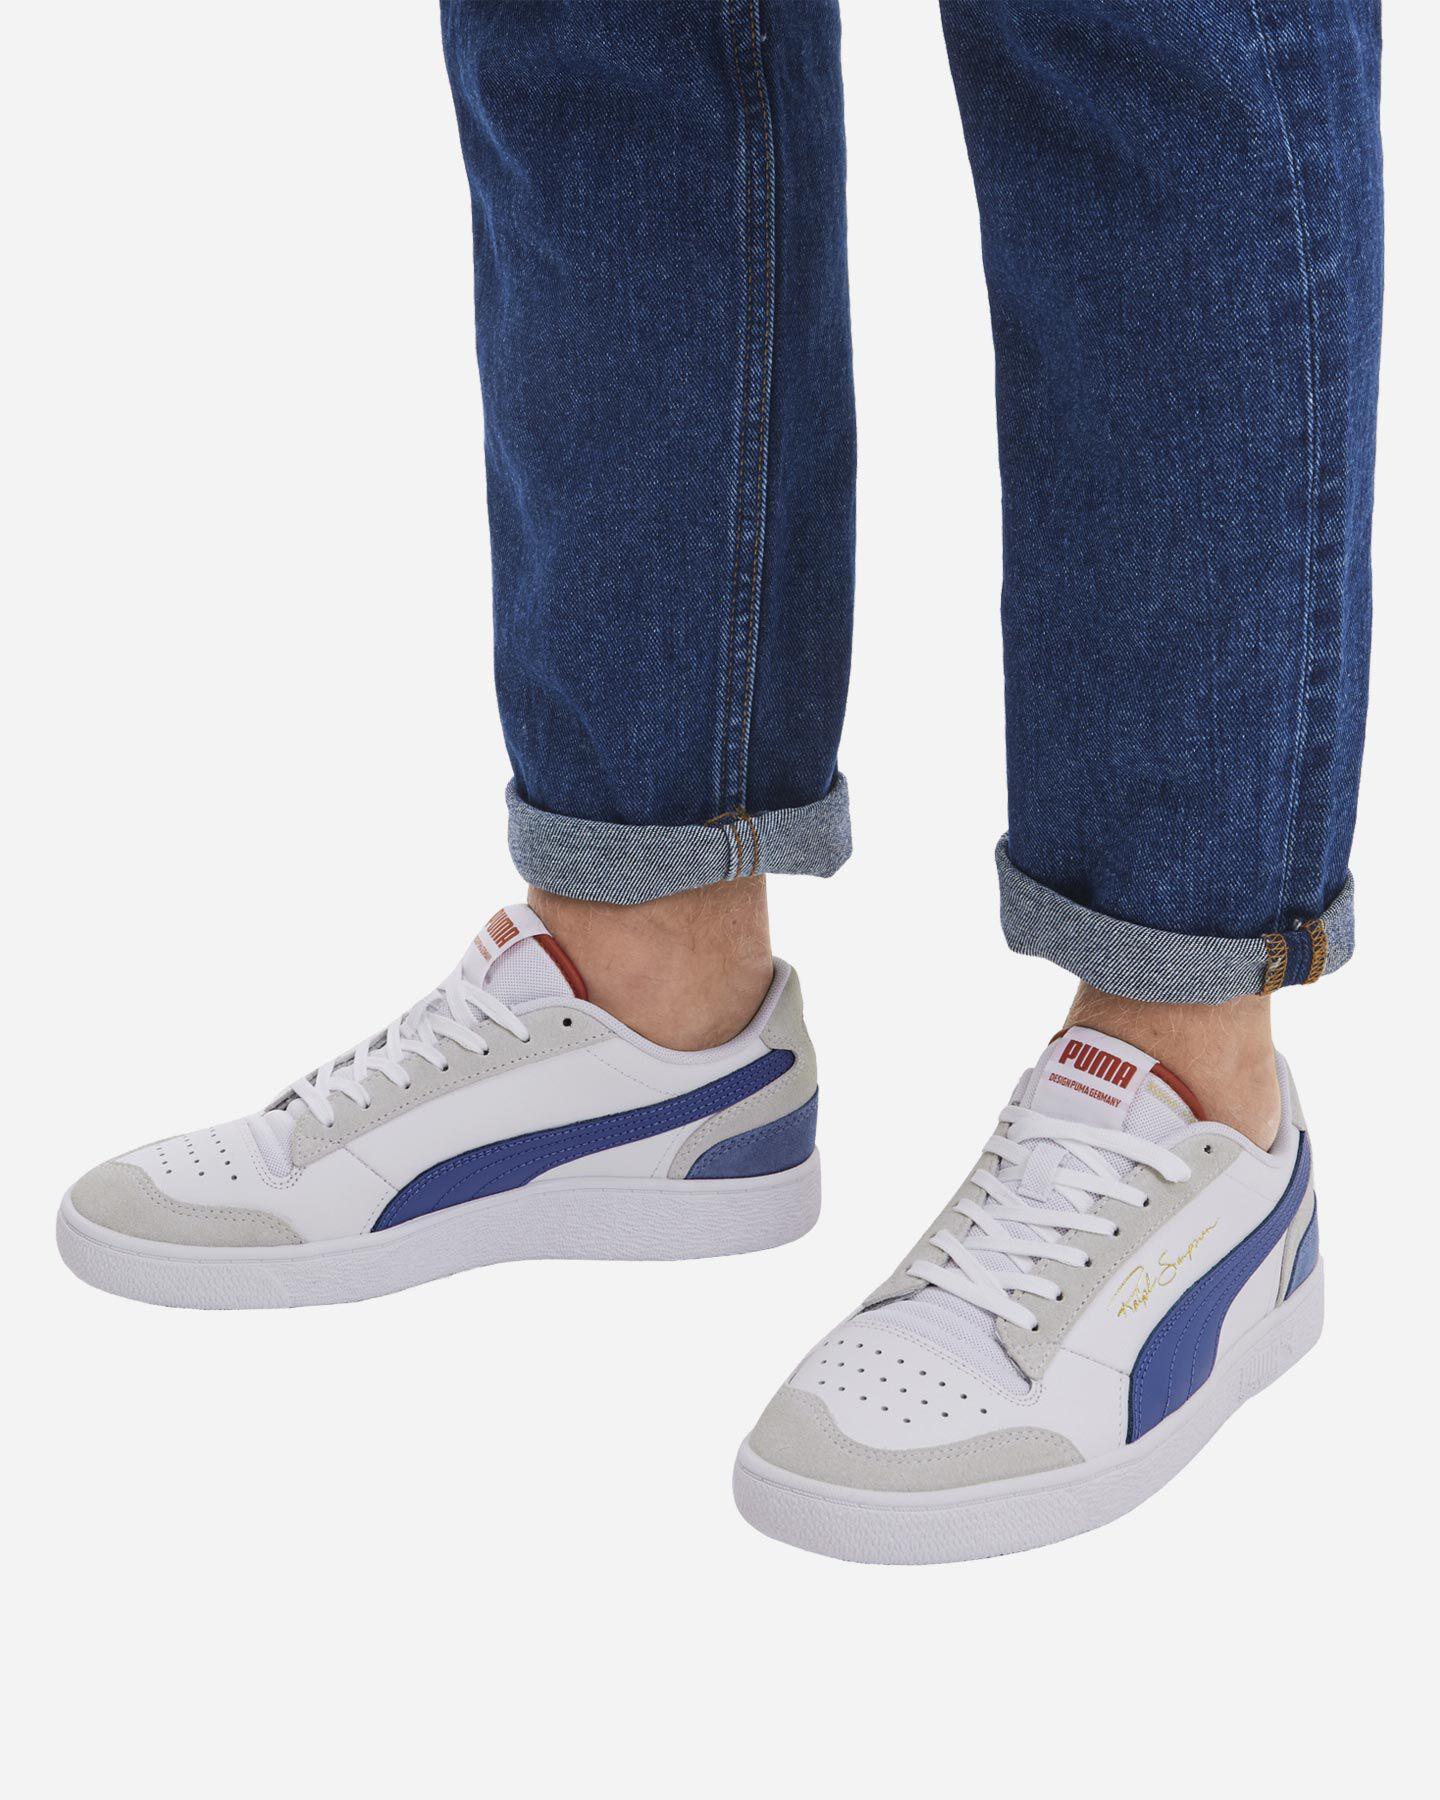 Scarpe sneakers PUMA RALPH SAMPSON LOW VINTAGE M S5188796 scatto 5